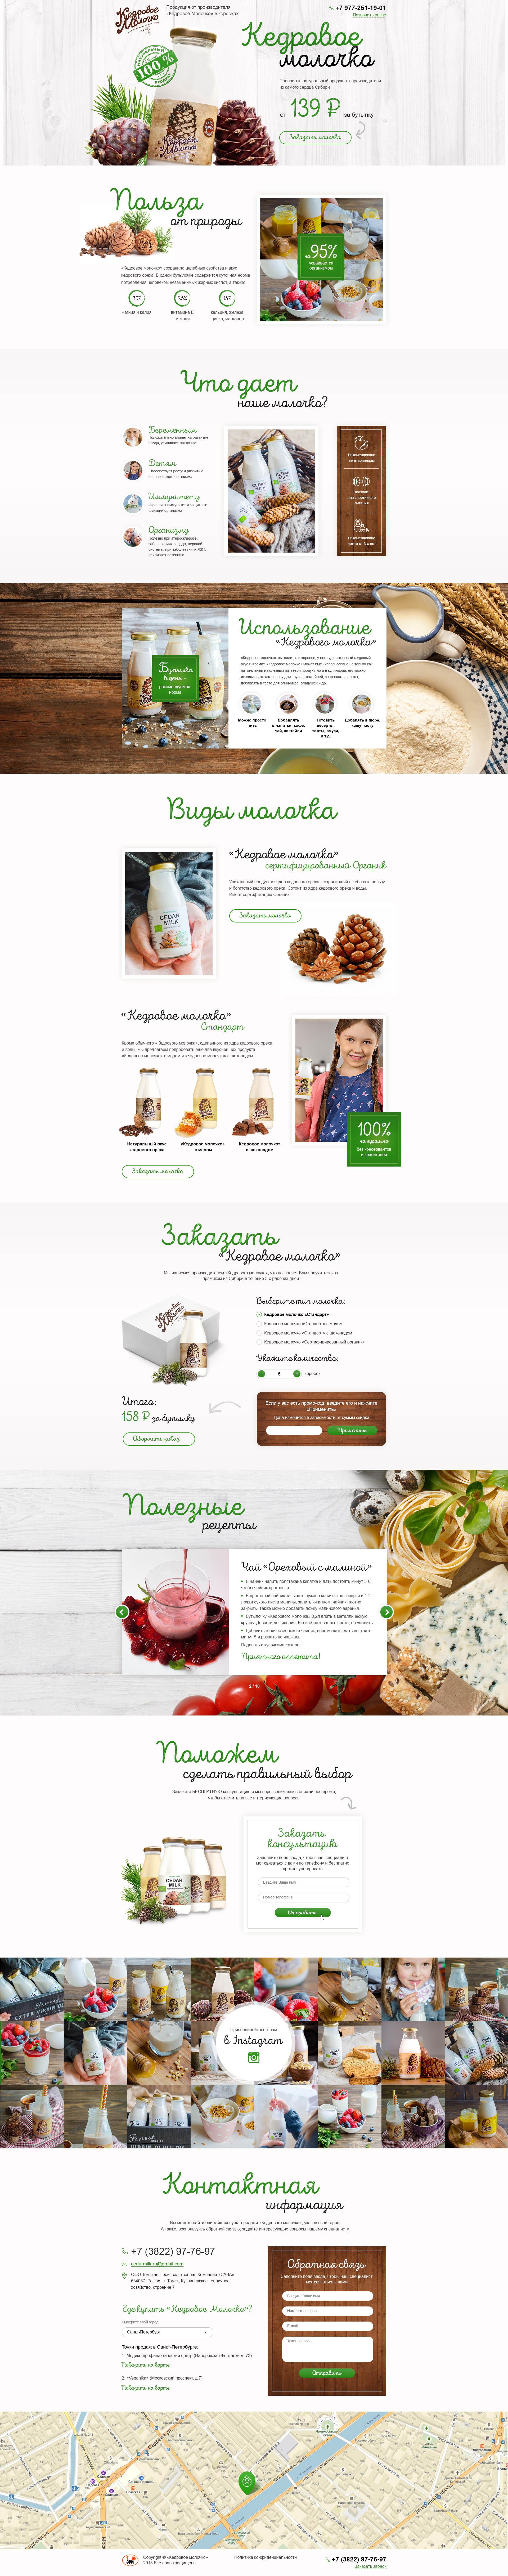 Разработка дизайна сайта lovepirogova.ru фото f_81956b1a7ba6f756.jpg